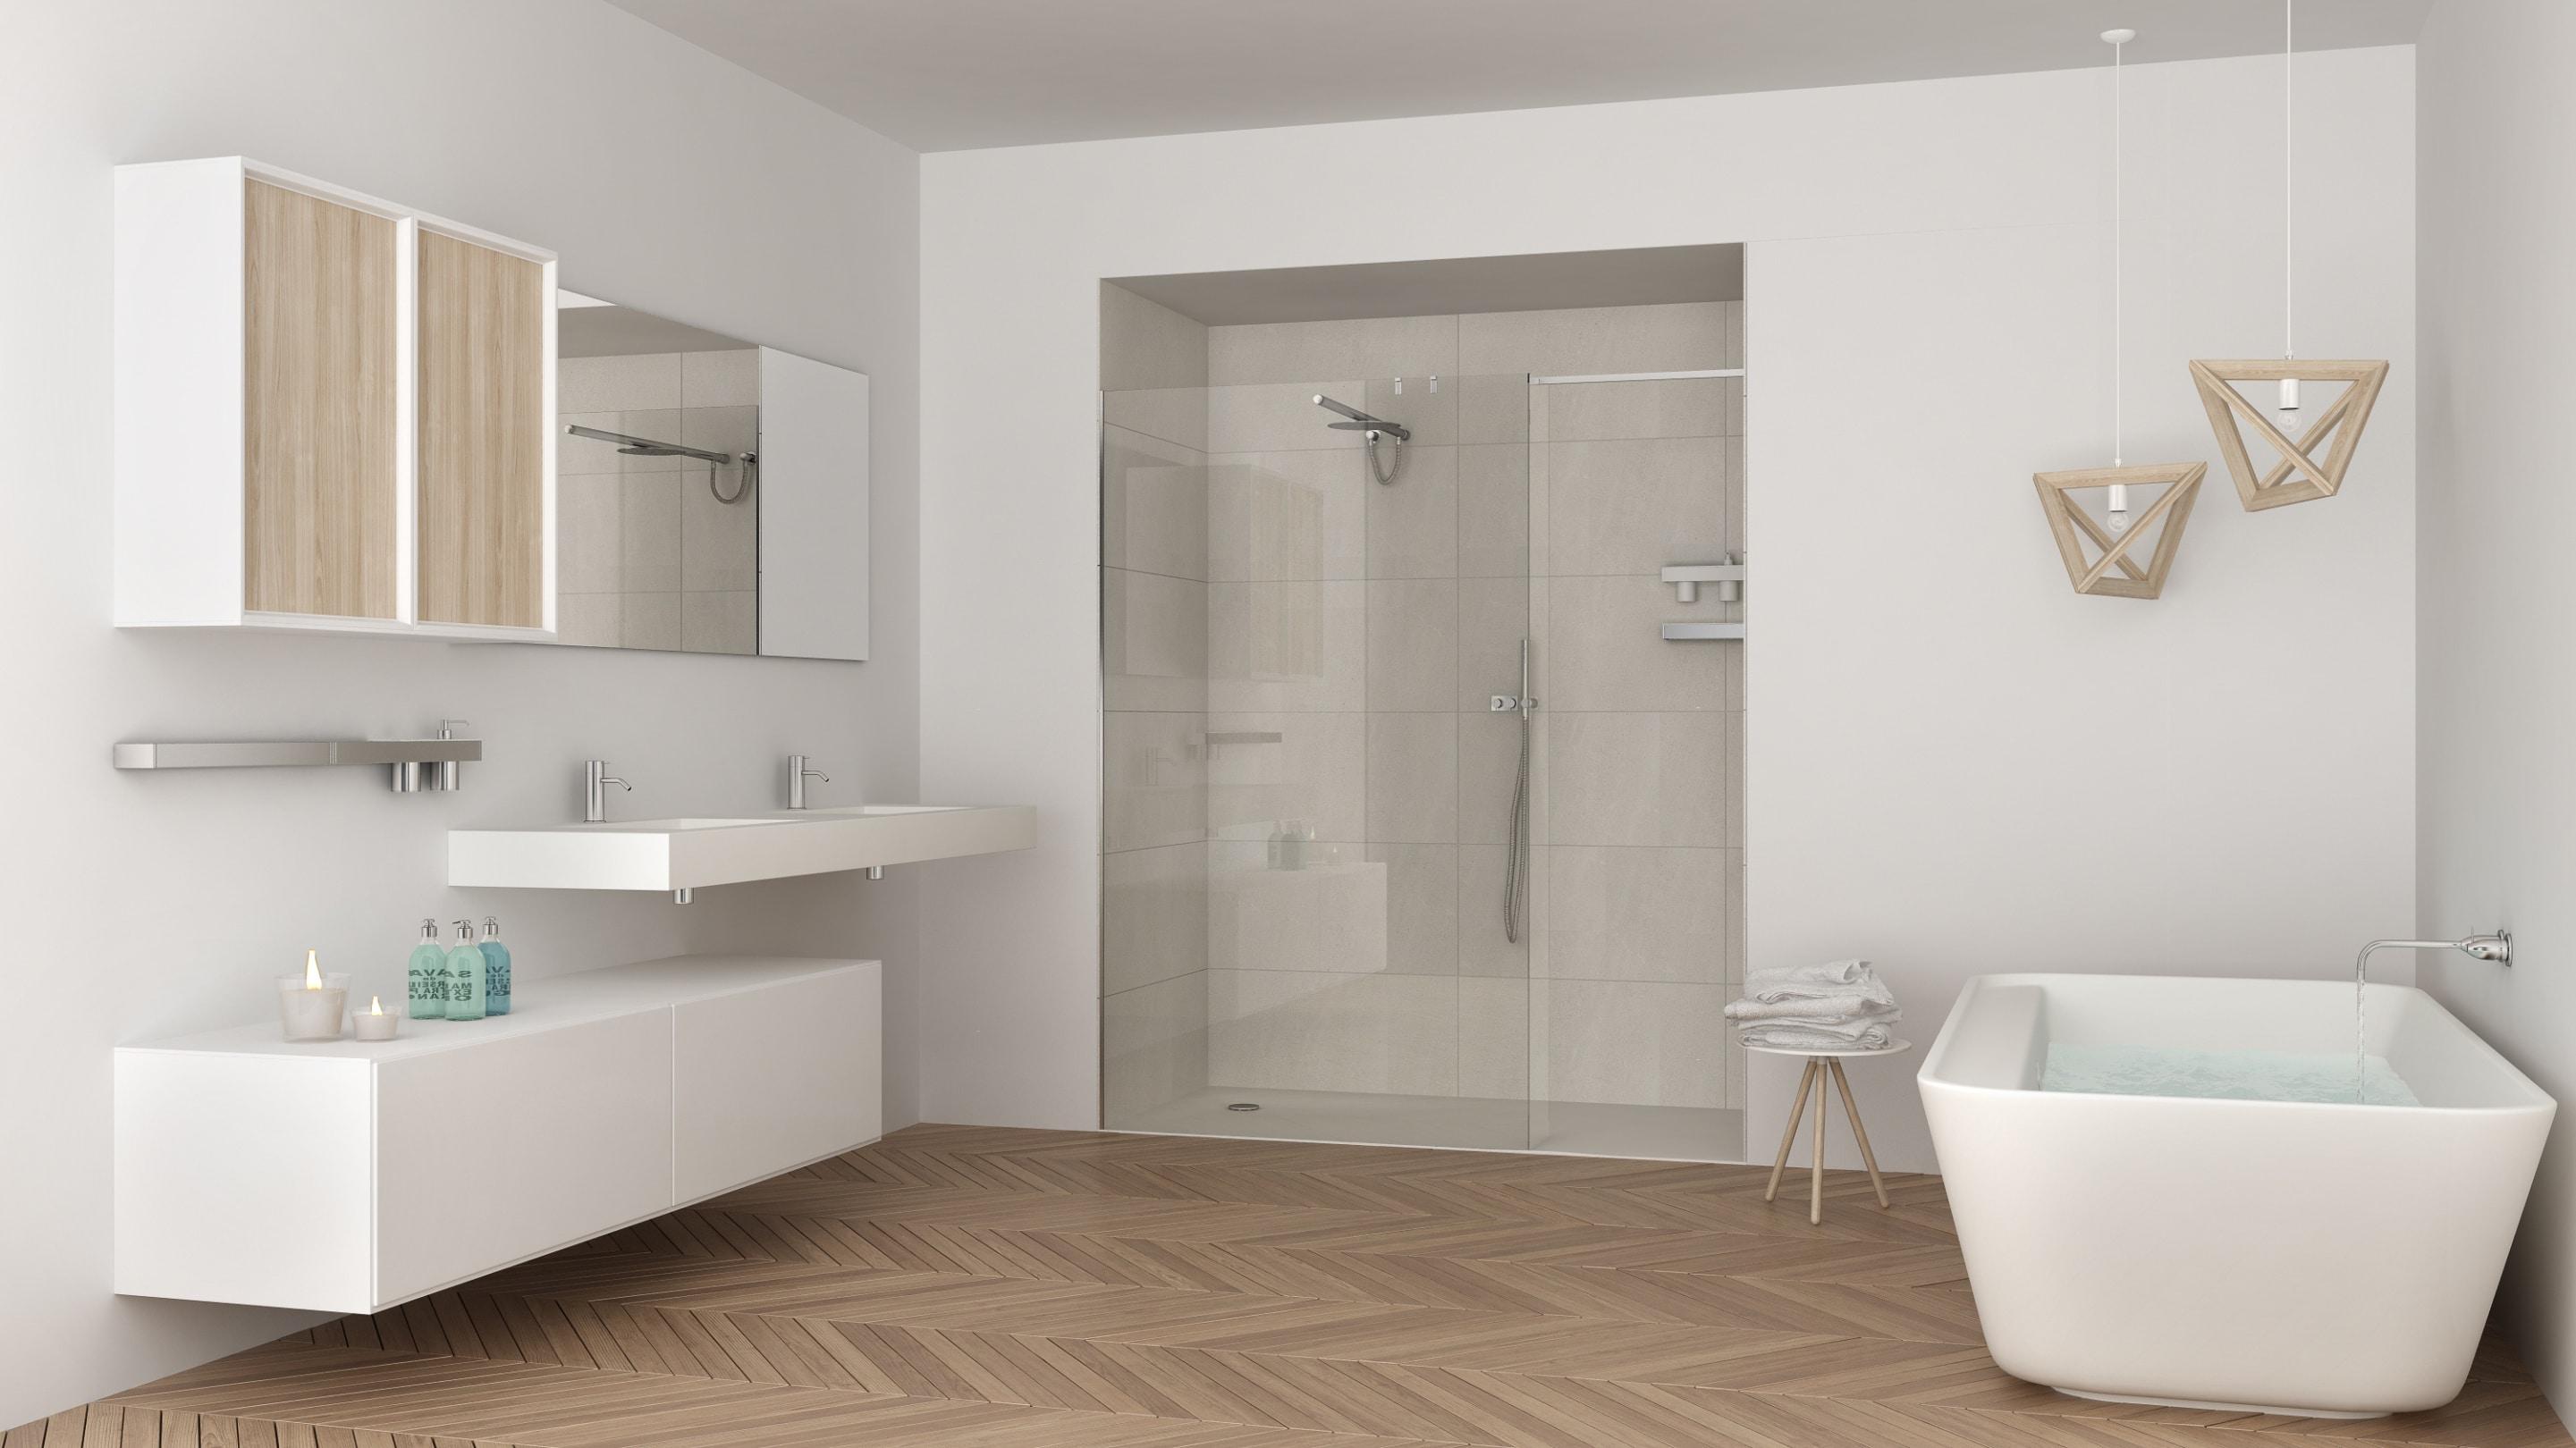 Meuble Haut Salle De Bain Avec Miroir prix d'un meuble de salle de bain